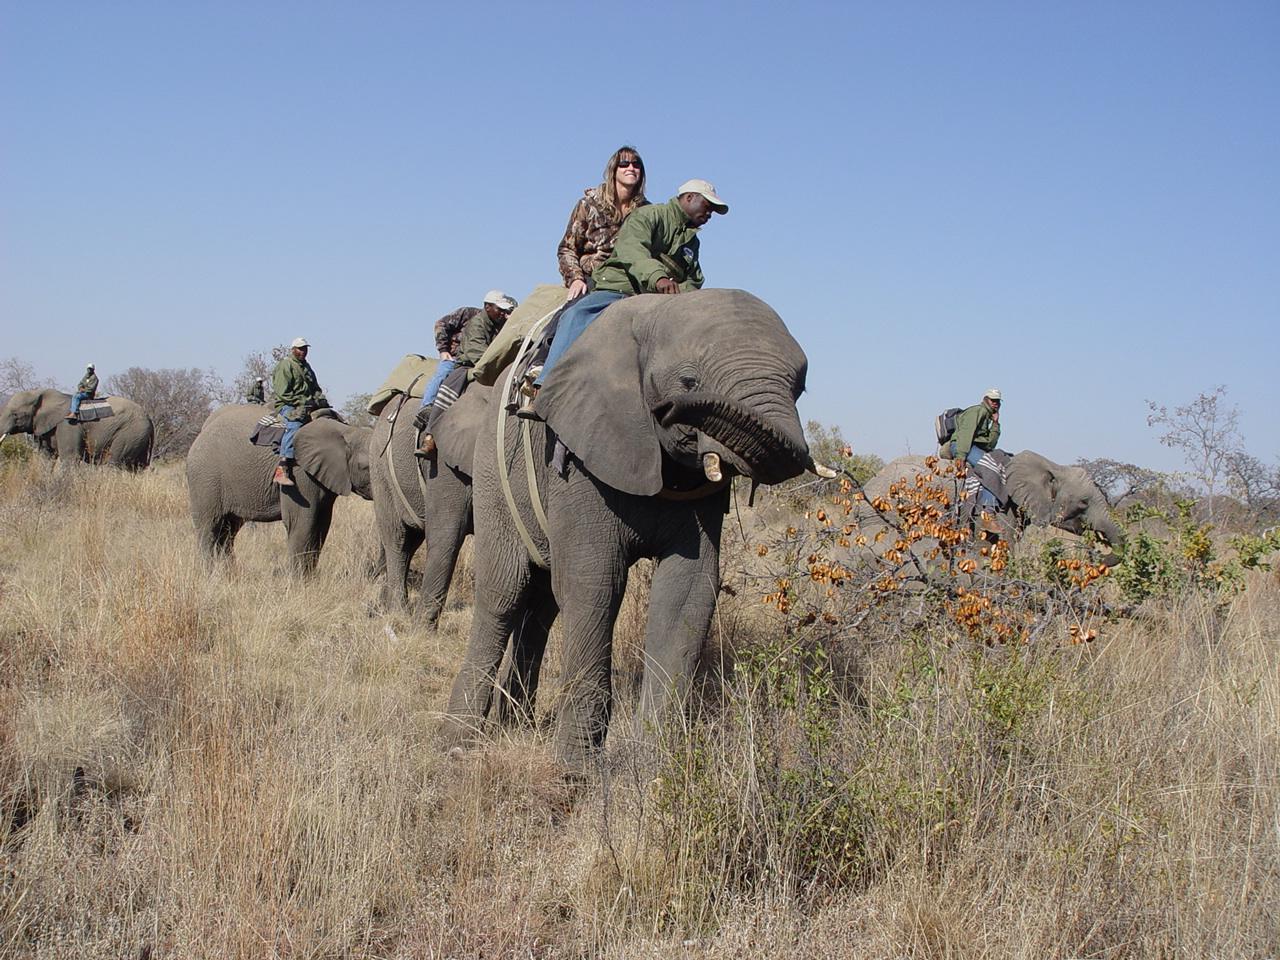 Africa 2009 106.jpg